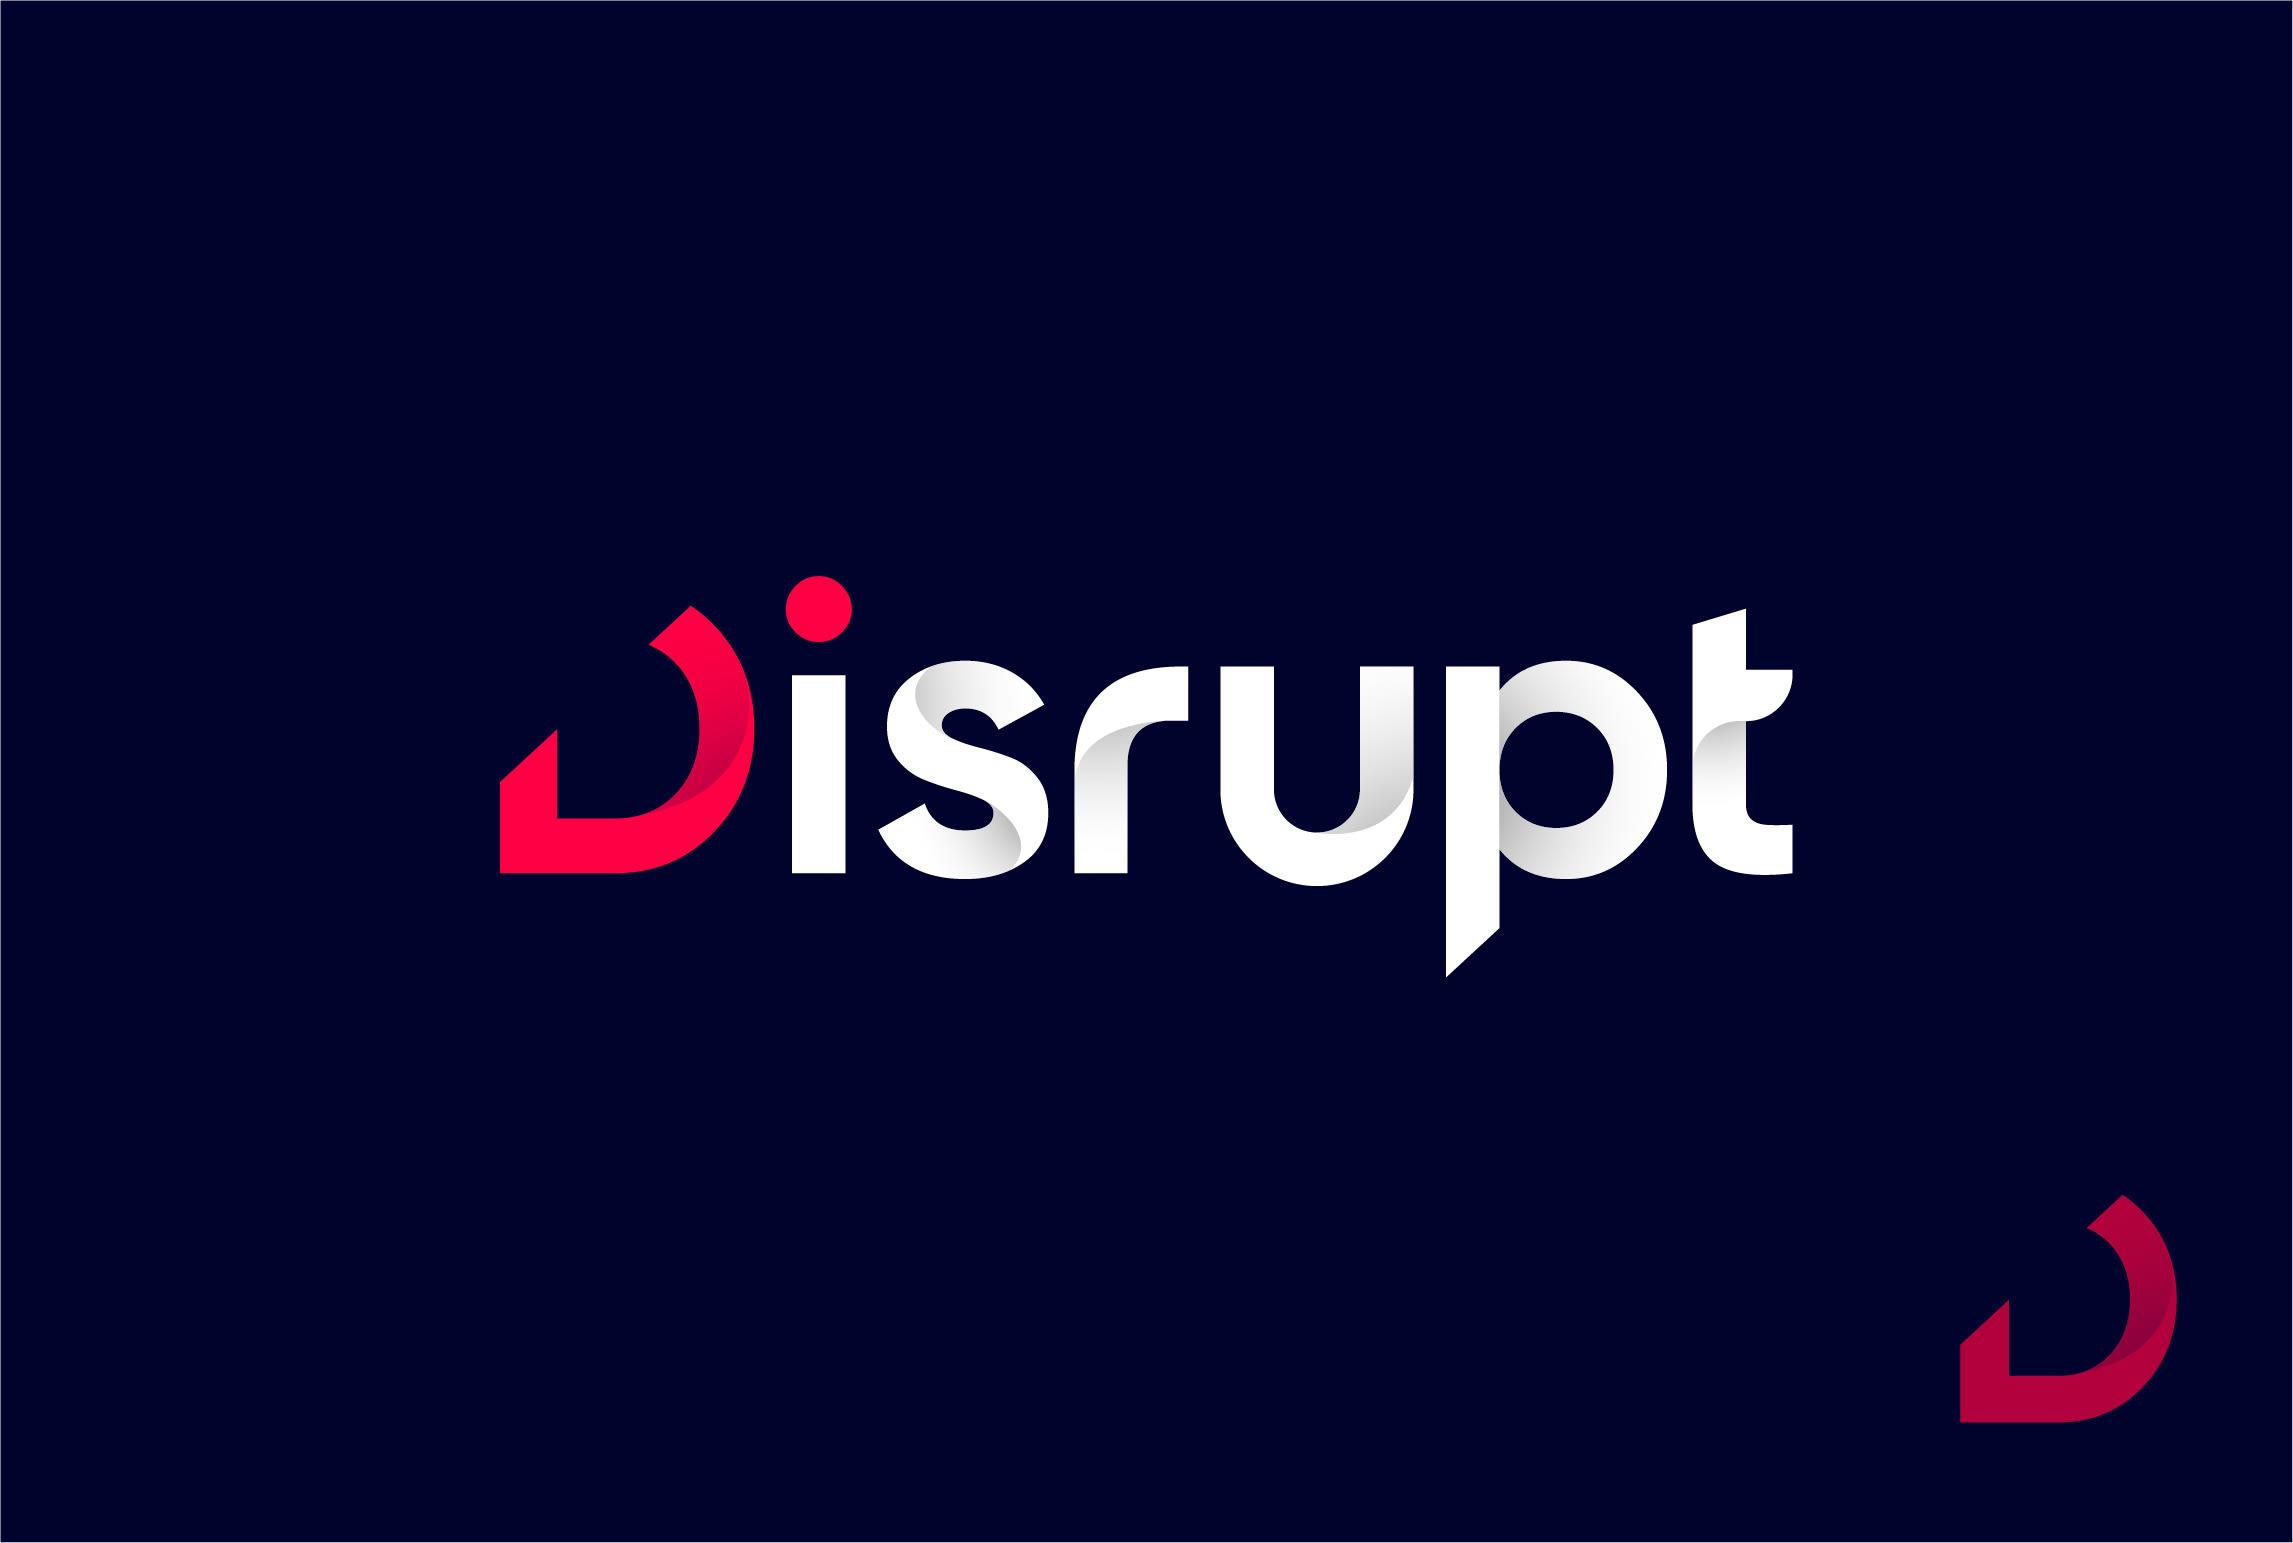 I Will Design Modern Typography Logo And Wordmark Logo